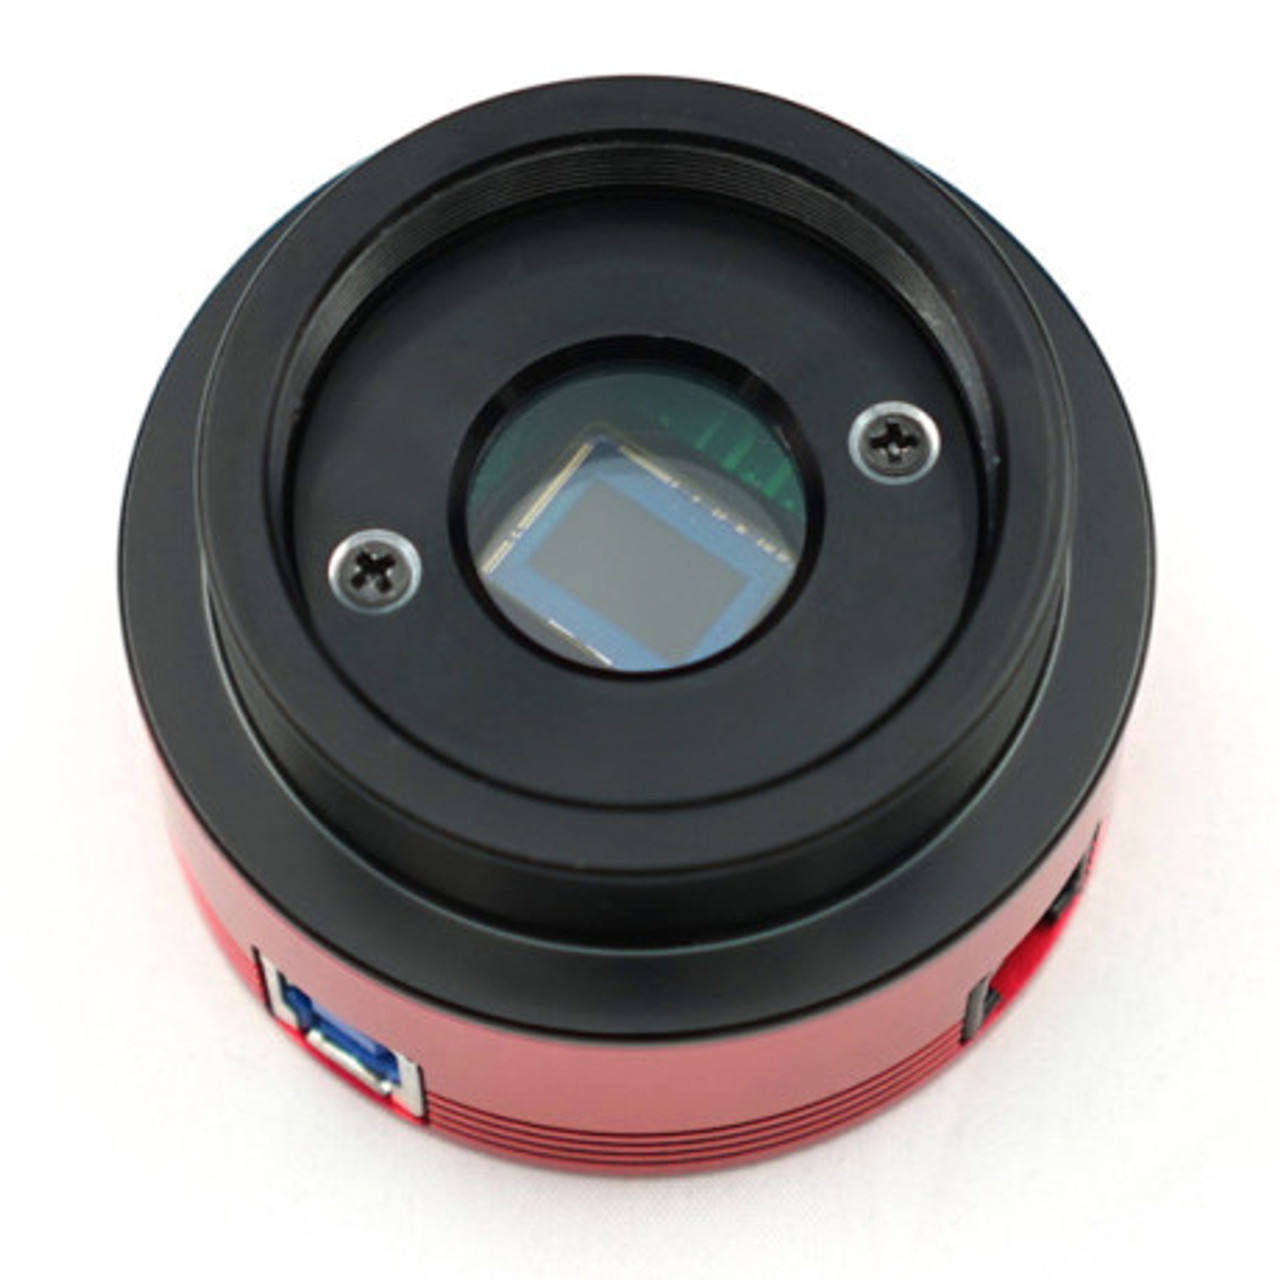 ZWO ASI174MM CMOS Monochrome Imaging Camera